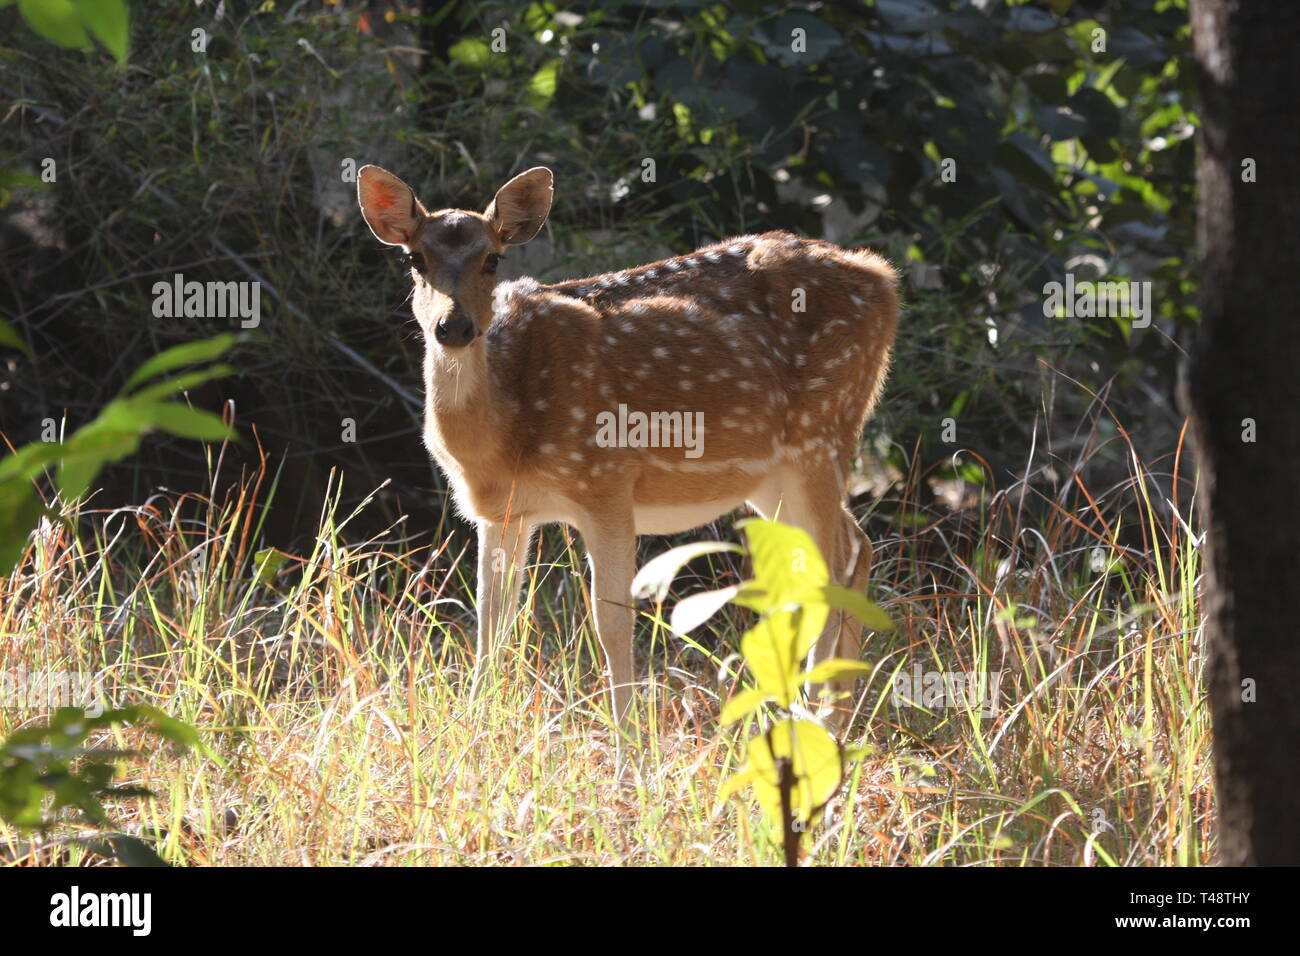 Spotted deer or Chital, Bandhavgarh National Park, Madhya Pradesh - Stock Image